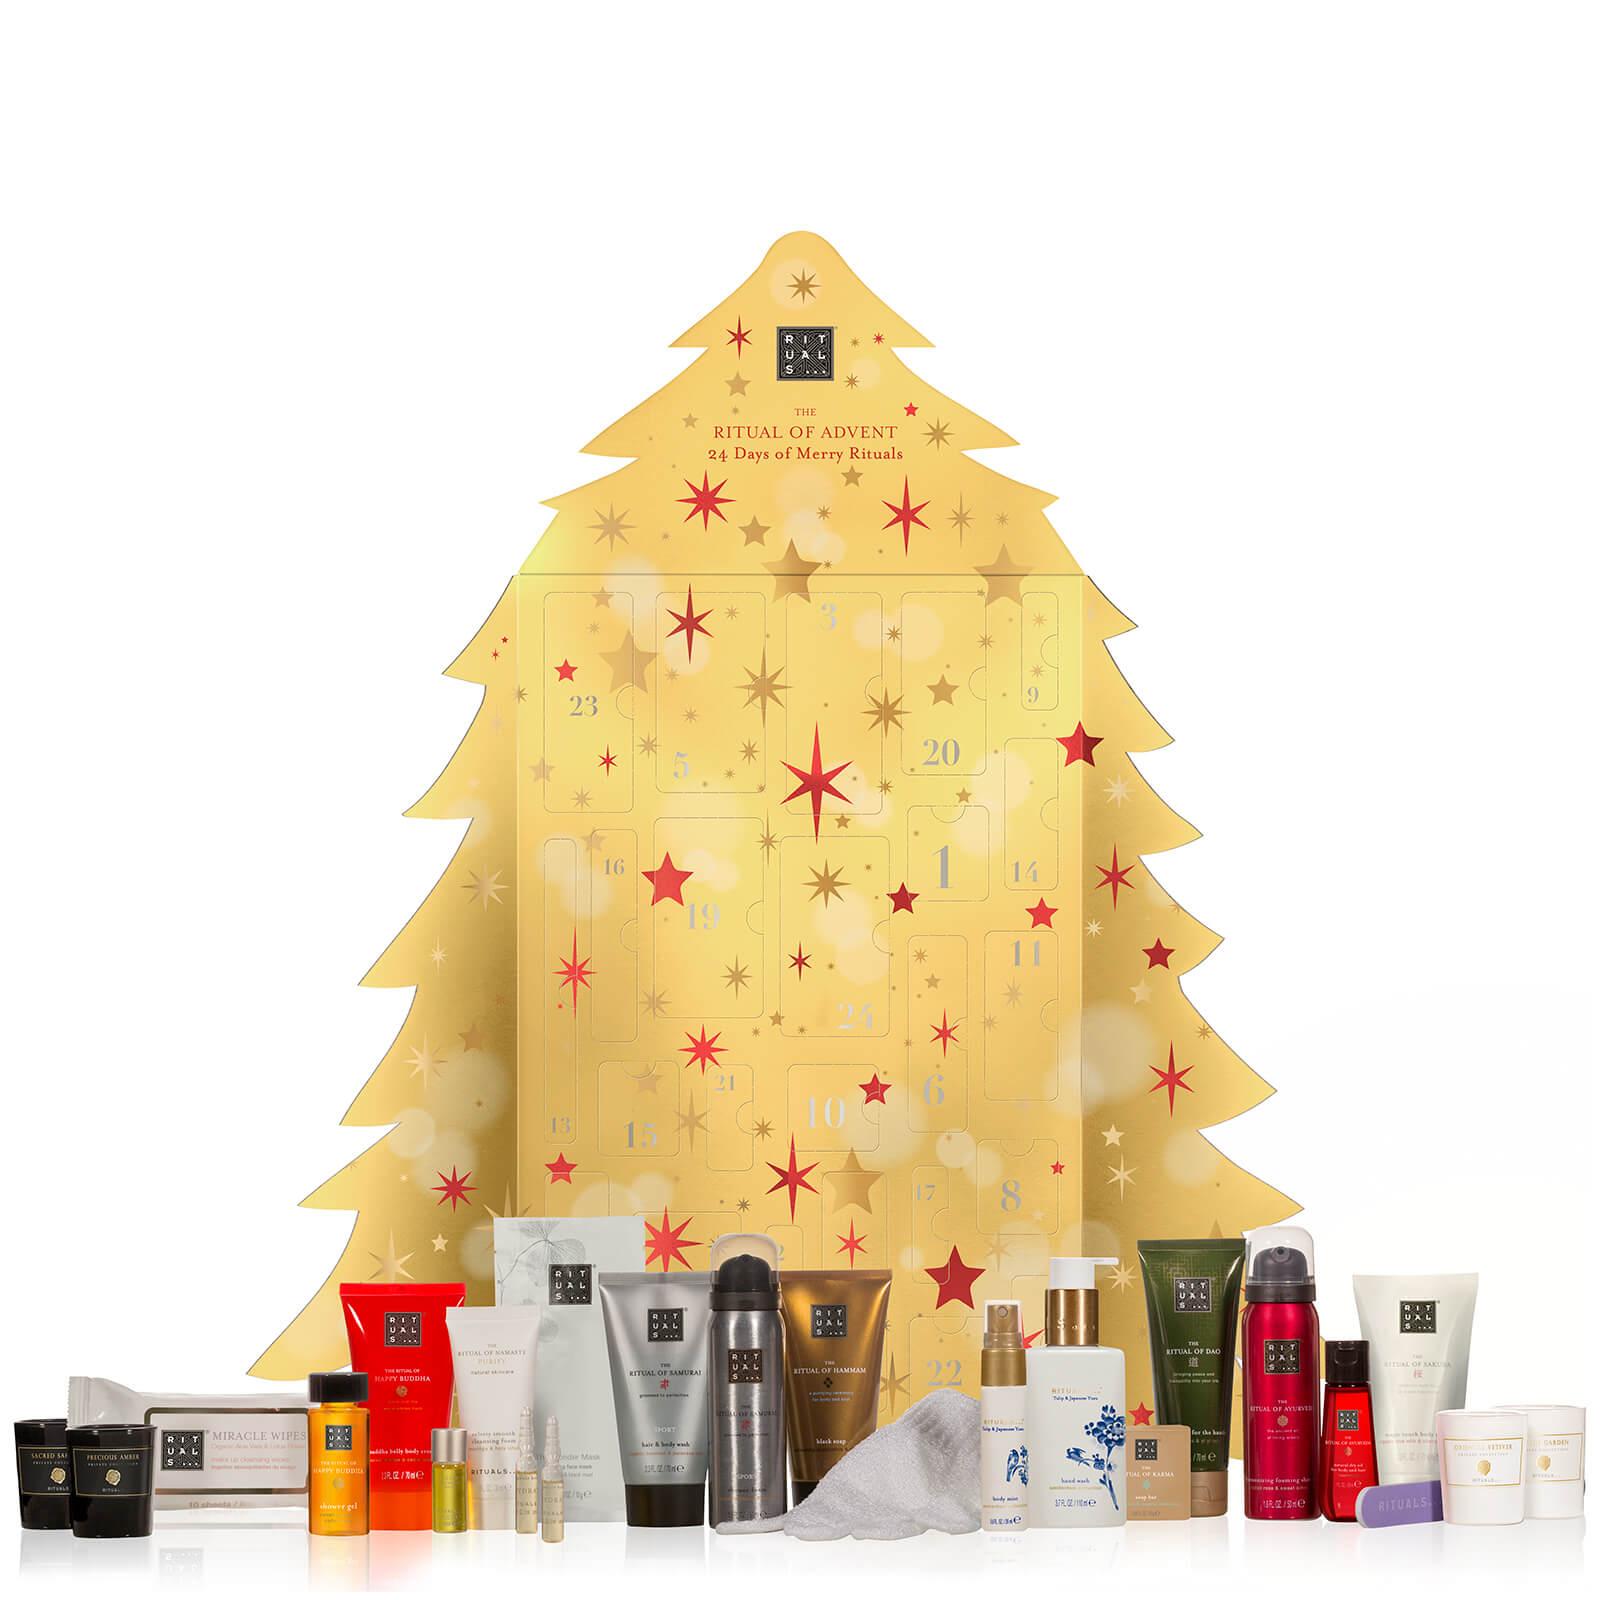 Rituals The Ritual of Advent 2D Christmas Tree Adventskalender